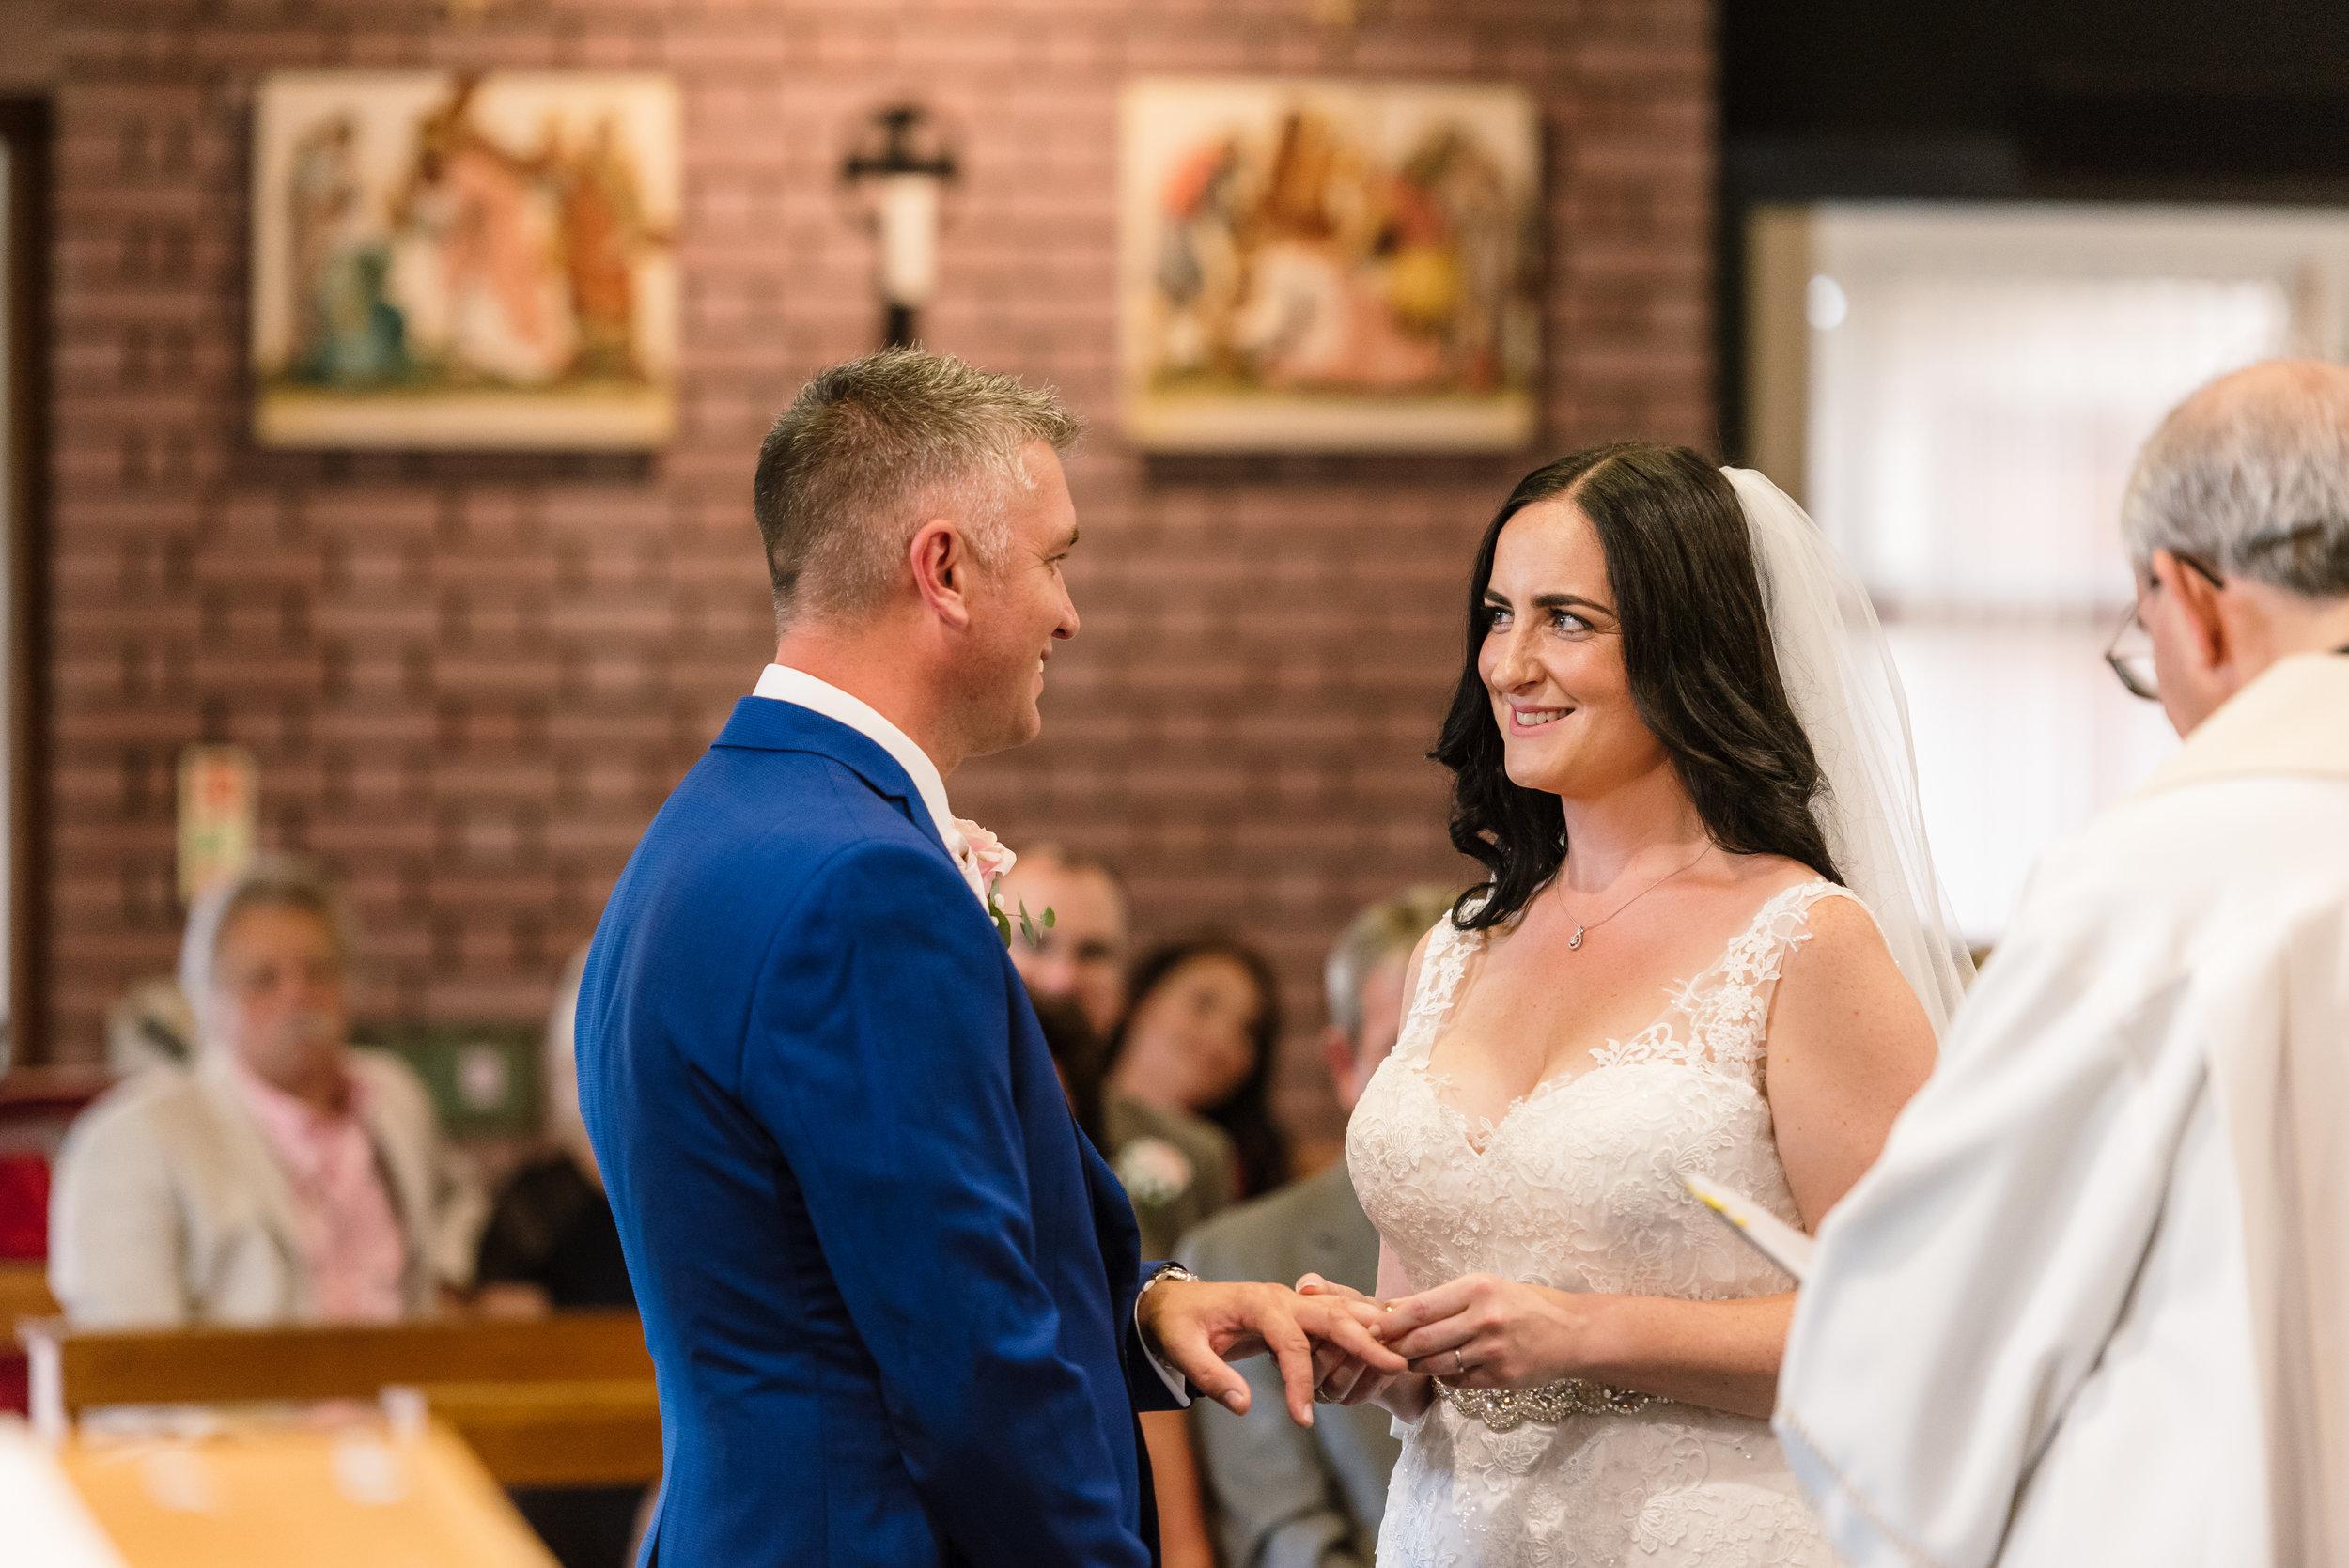 Sarah-Fishlock-Photography : Hampshire-wedding-photographer-hampshire : fleet-wedding-photographer-fleet : Meade-Hall-Wedding-Photographer : Meade-Hall-Wedding-Photos-509.jpg